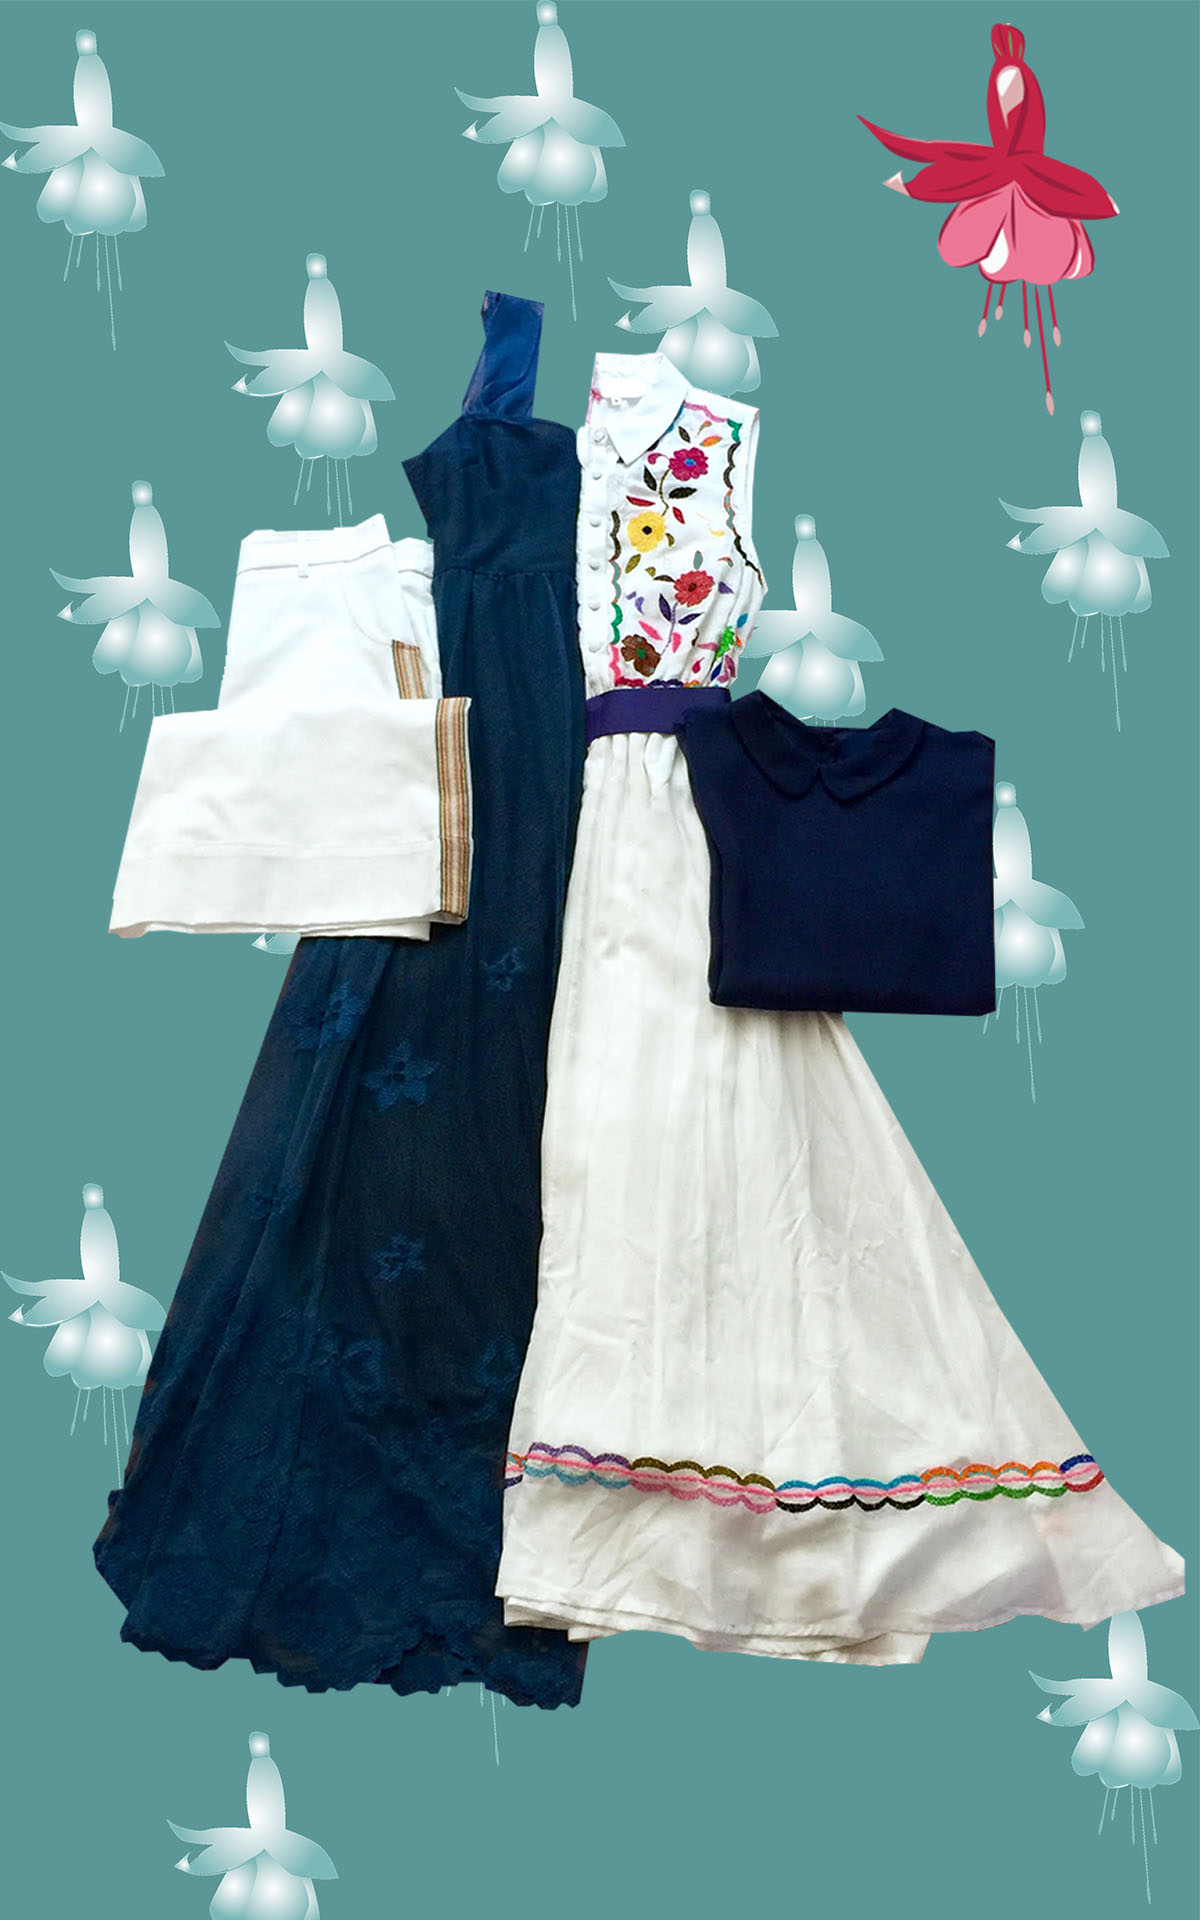 princesse-metropolitain-abitilunghi-03